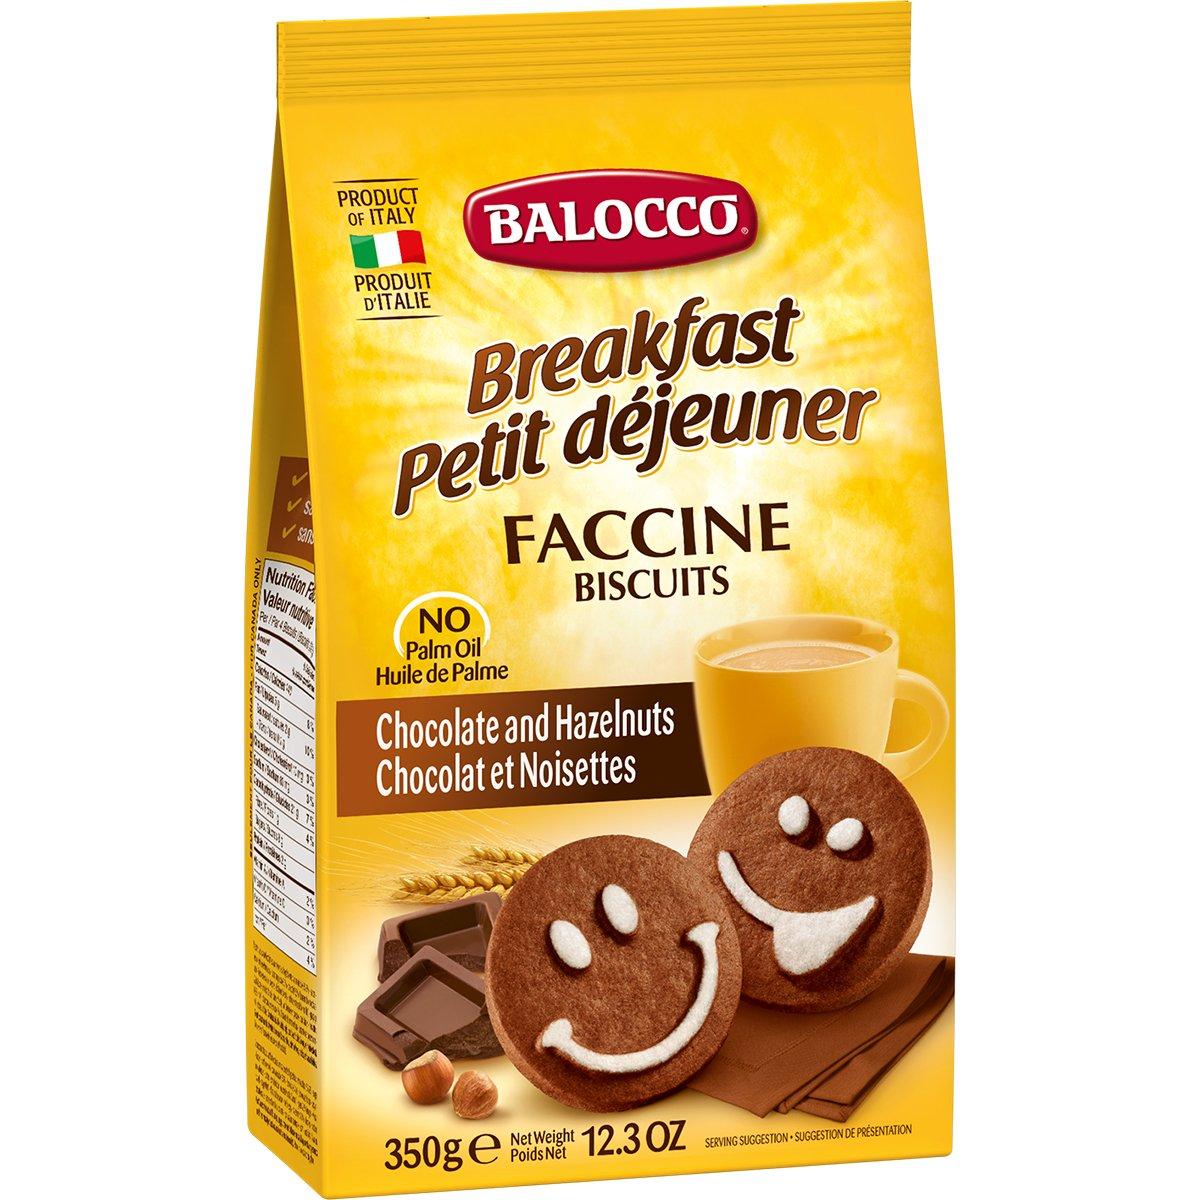 Biscuiti cu ciocolata si alune Balocco Faccine, 350 g imagine